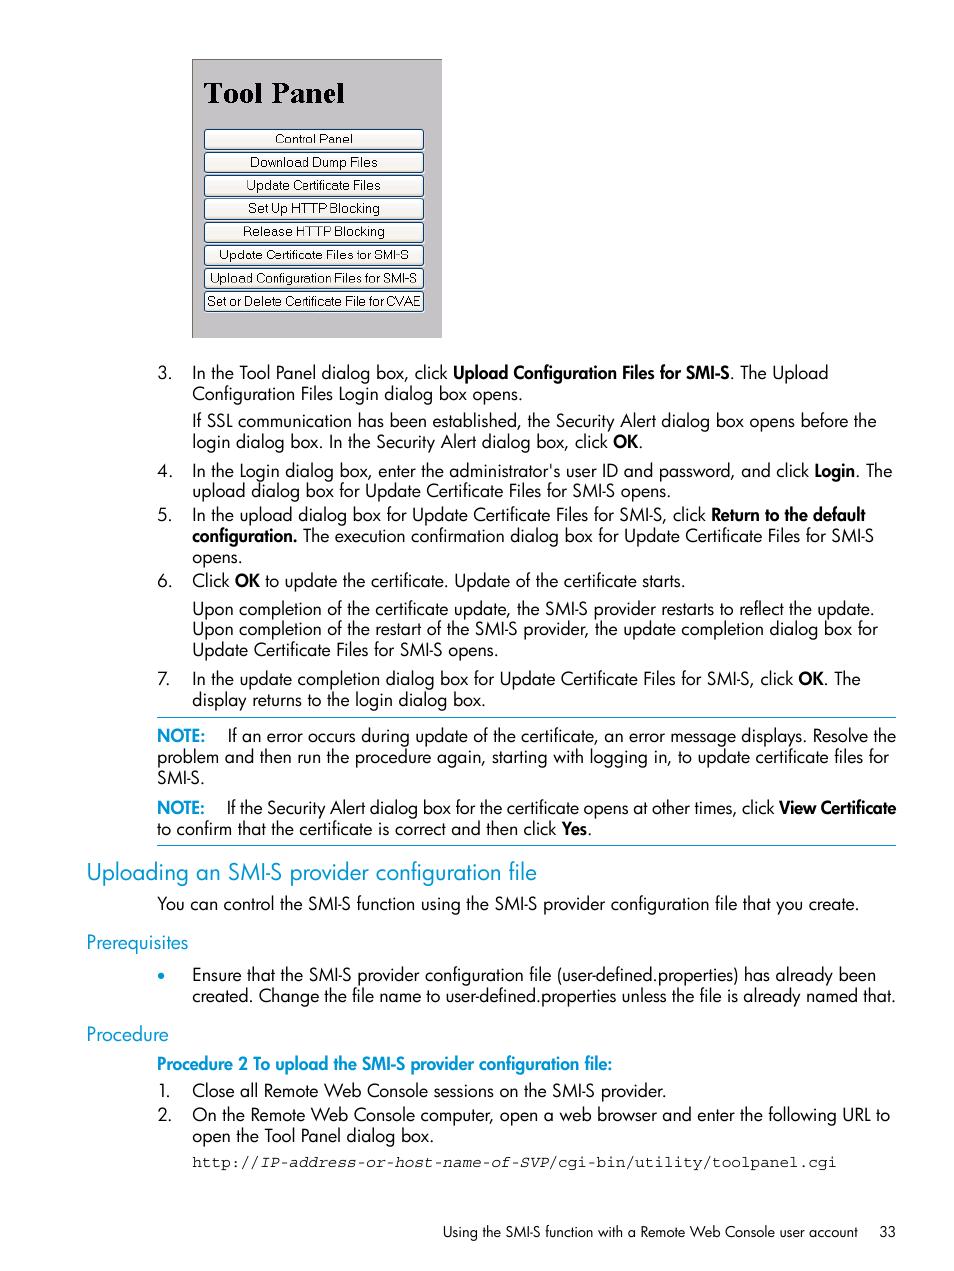 Uploading An Smi S Provider Configuration File Prerequisites